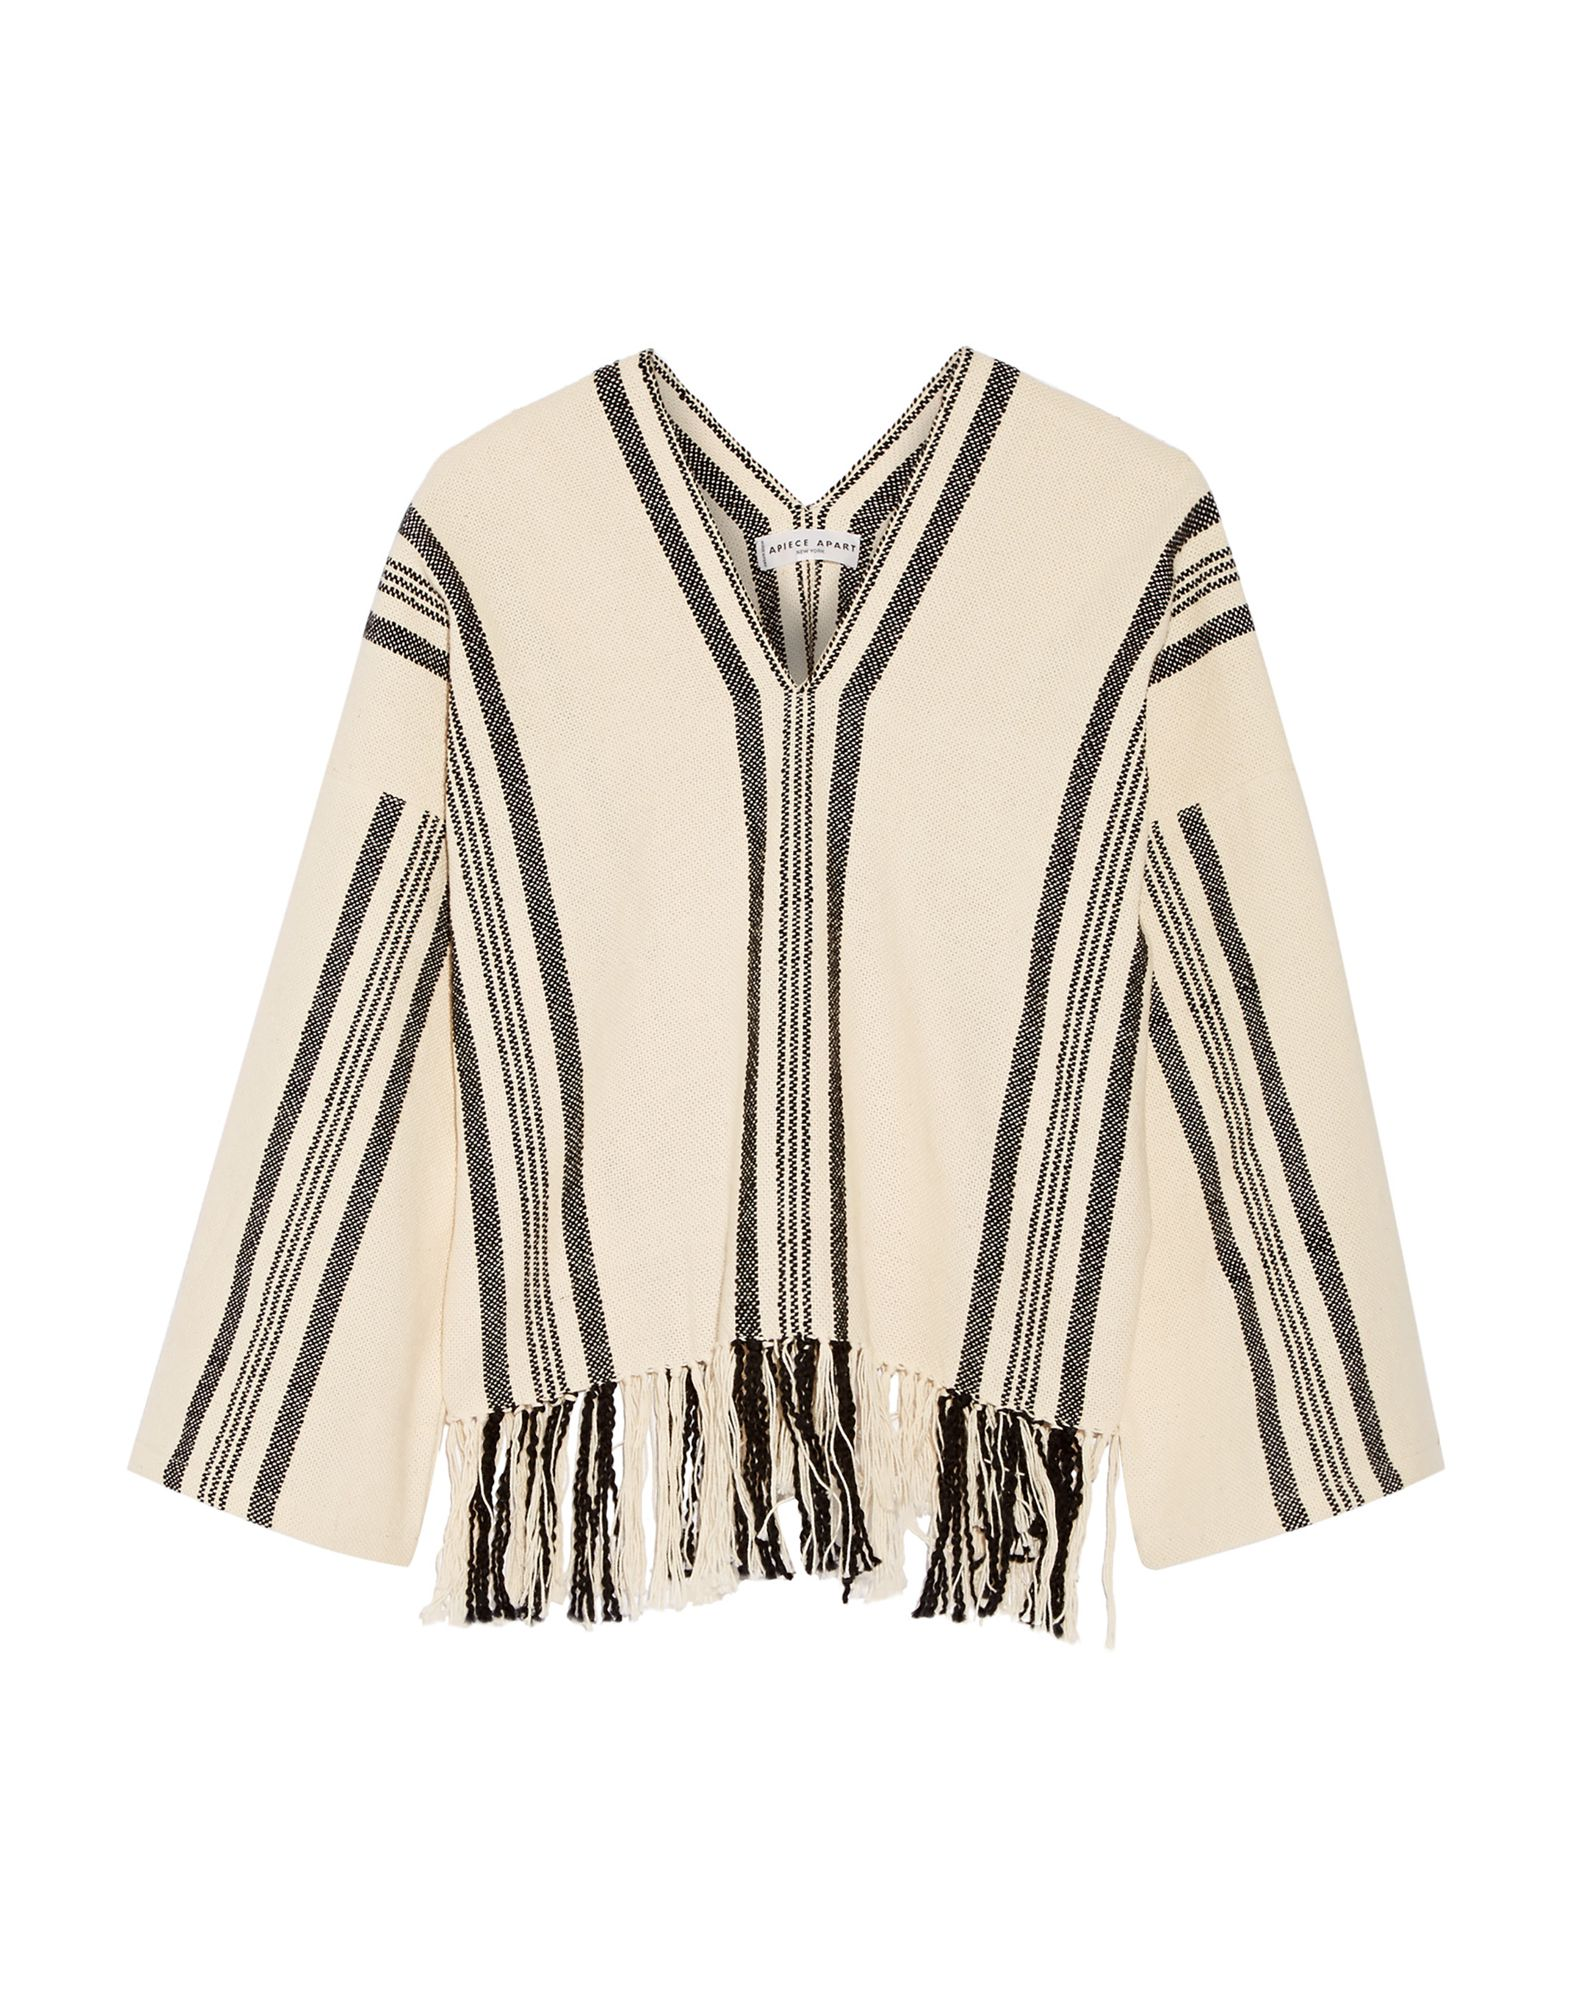 APIECE APART Блузка блузка apart блузка